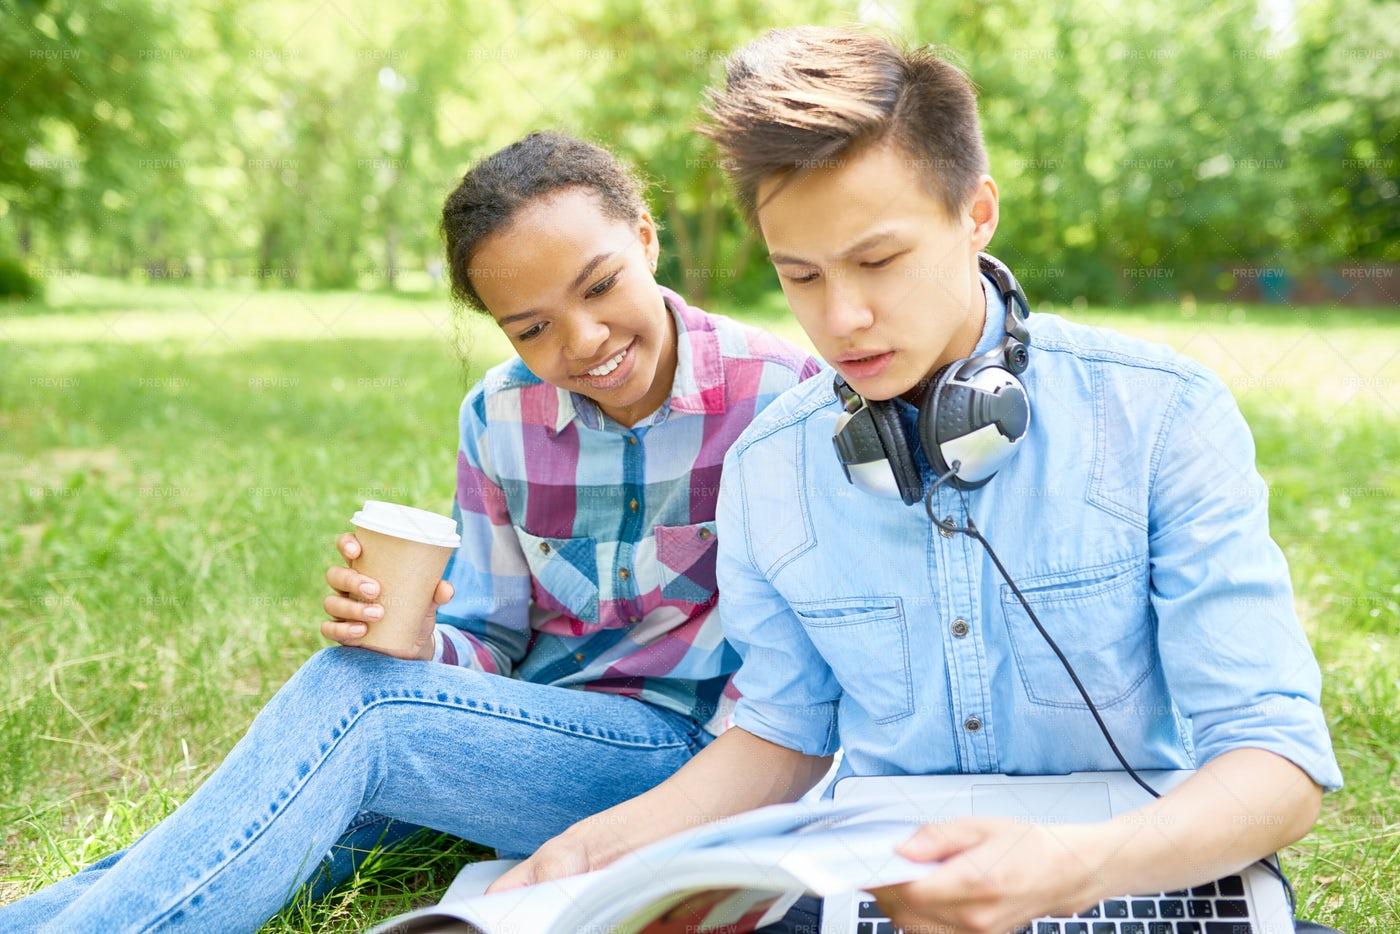 Students Doing Homework Outdoors On...: Stock Photos